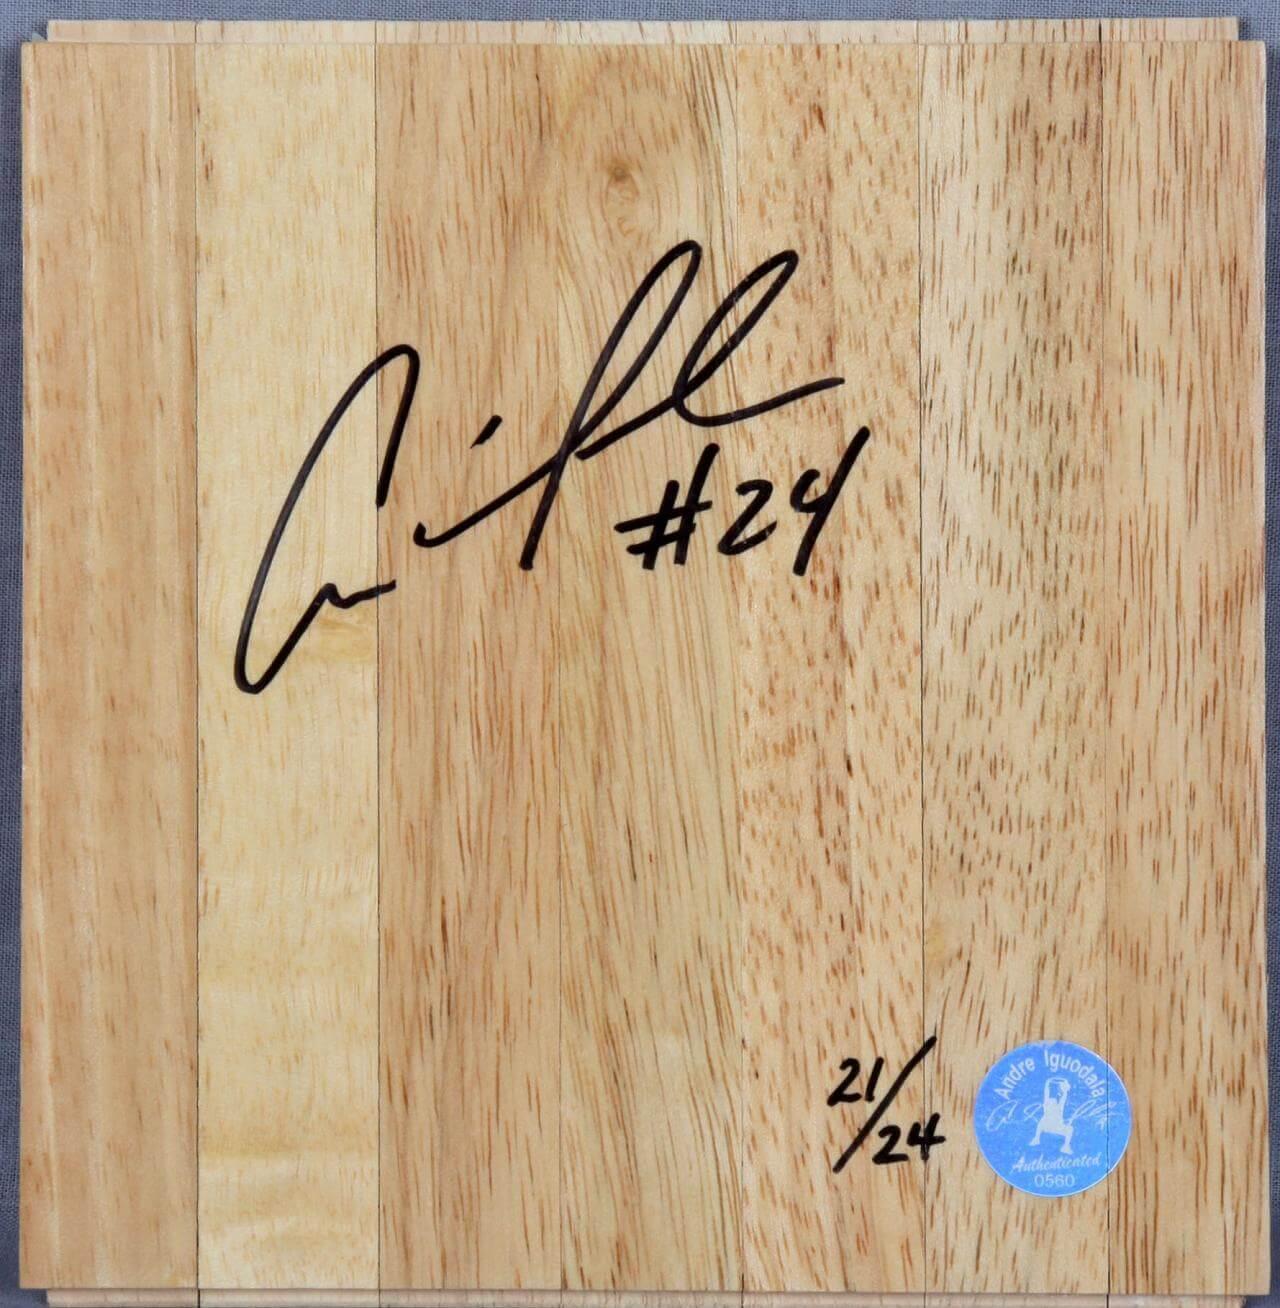 Andre Iguodala 76ers Signed Insribed # 24 Wood Floor Player's Hologram & Letter